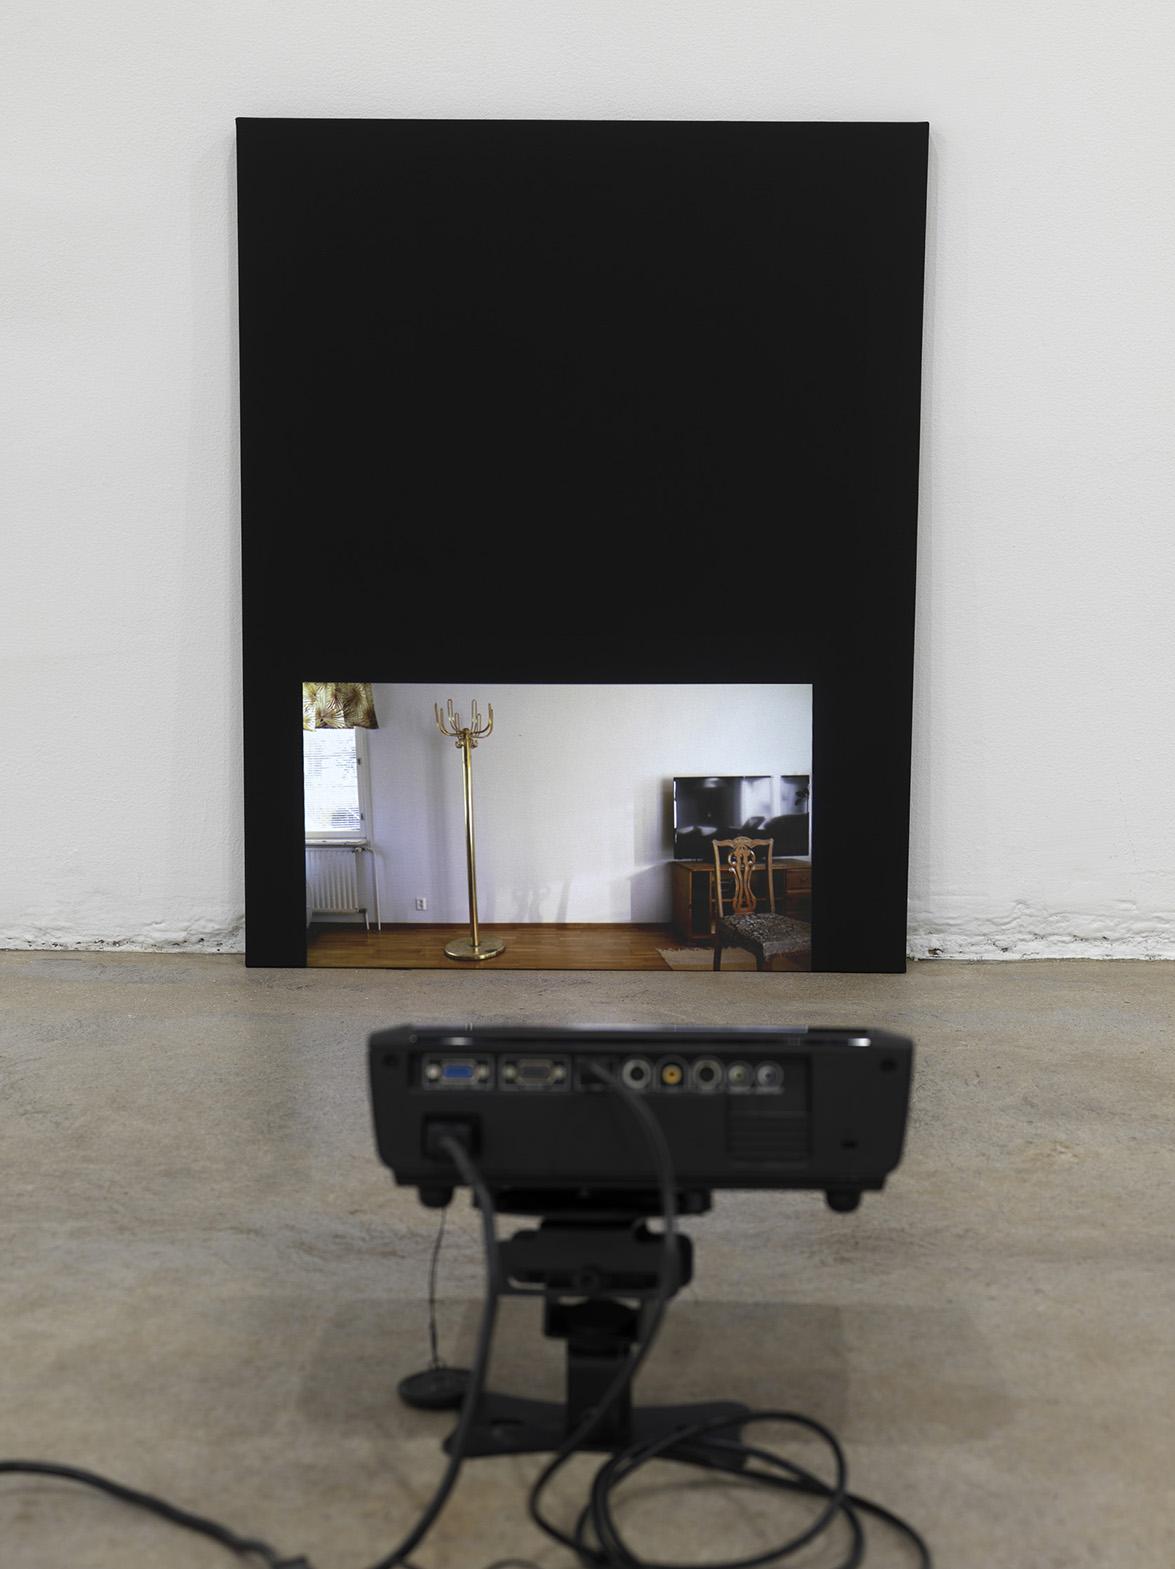 Iiu Susiraja,  Olen valmis 1 , 2016. Video, 0'51. Installation view at Ramiken Crucible.